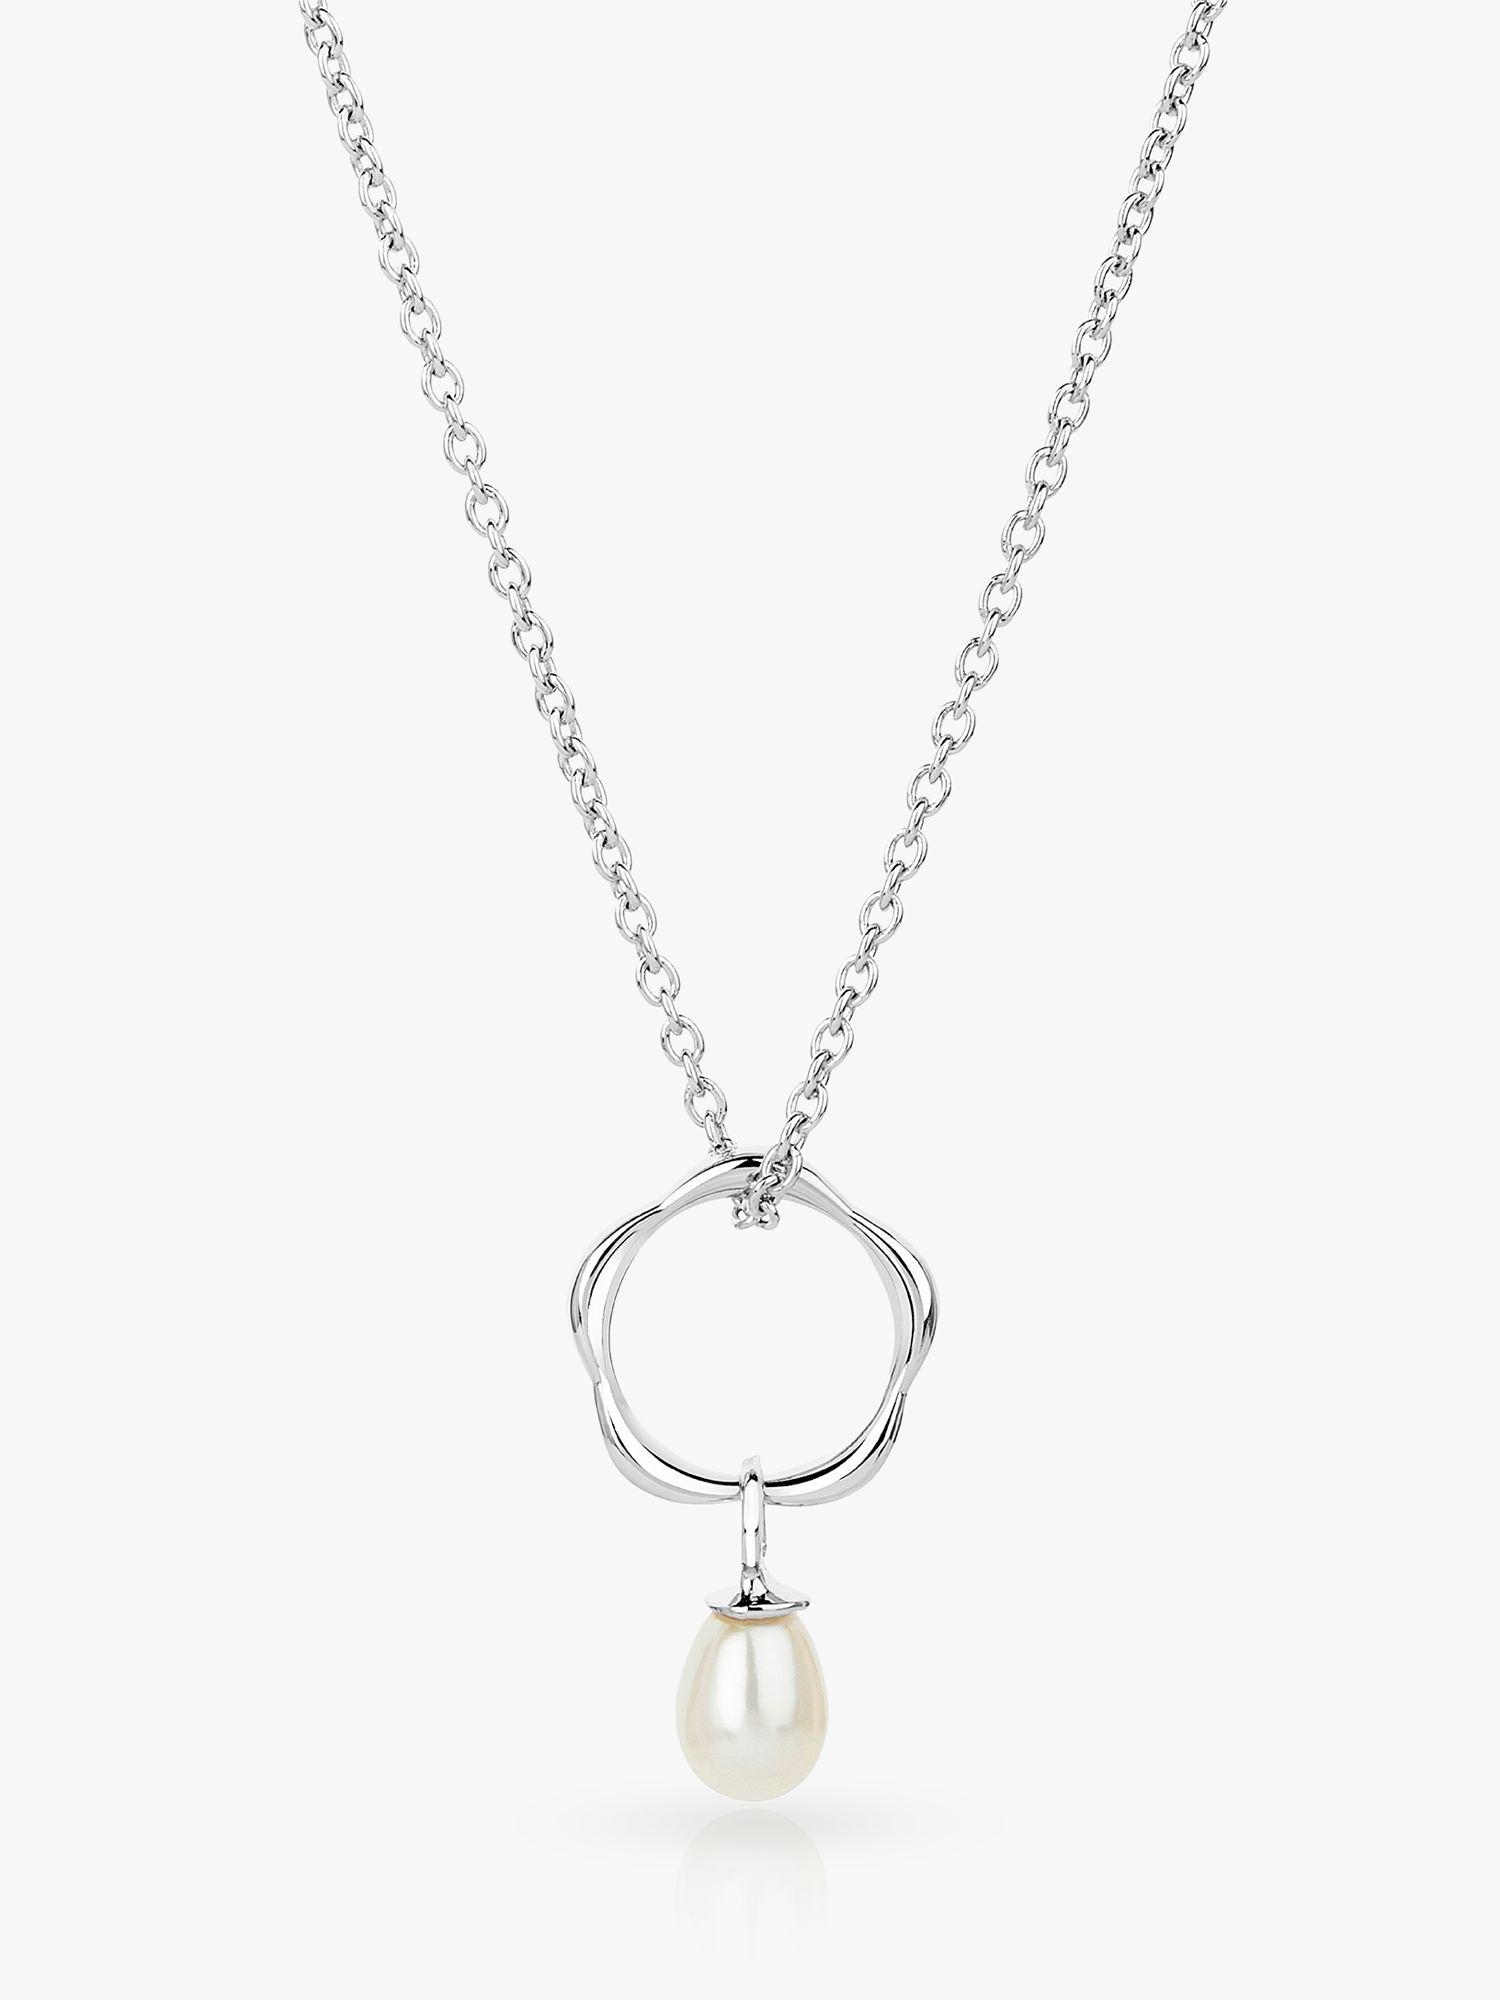 Claudia Bradby Claudia Bradby Dream Catcher Freshwater Pearl Pendant Necklace, Silver